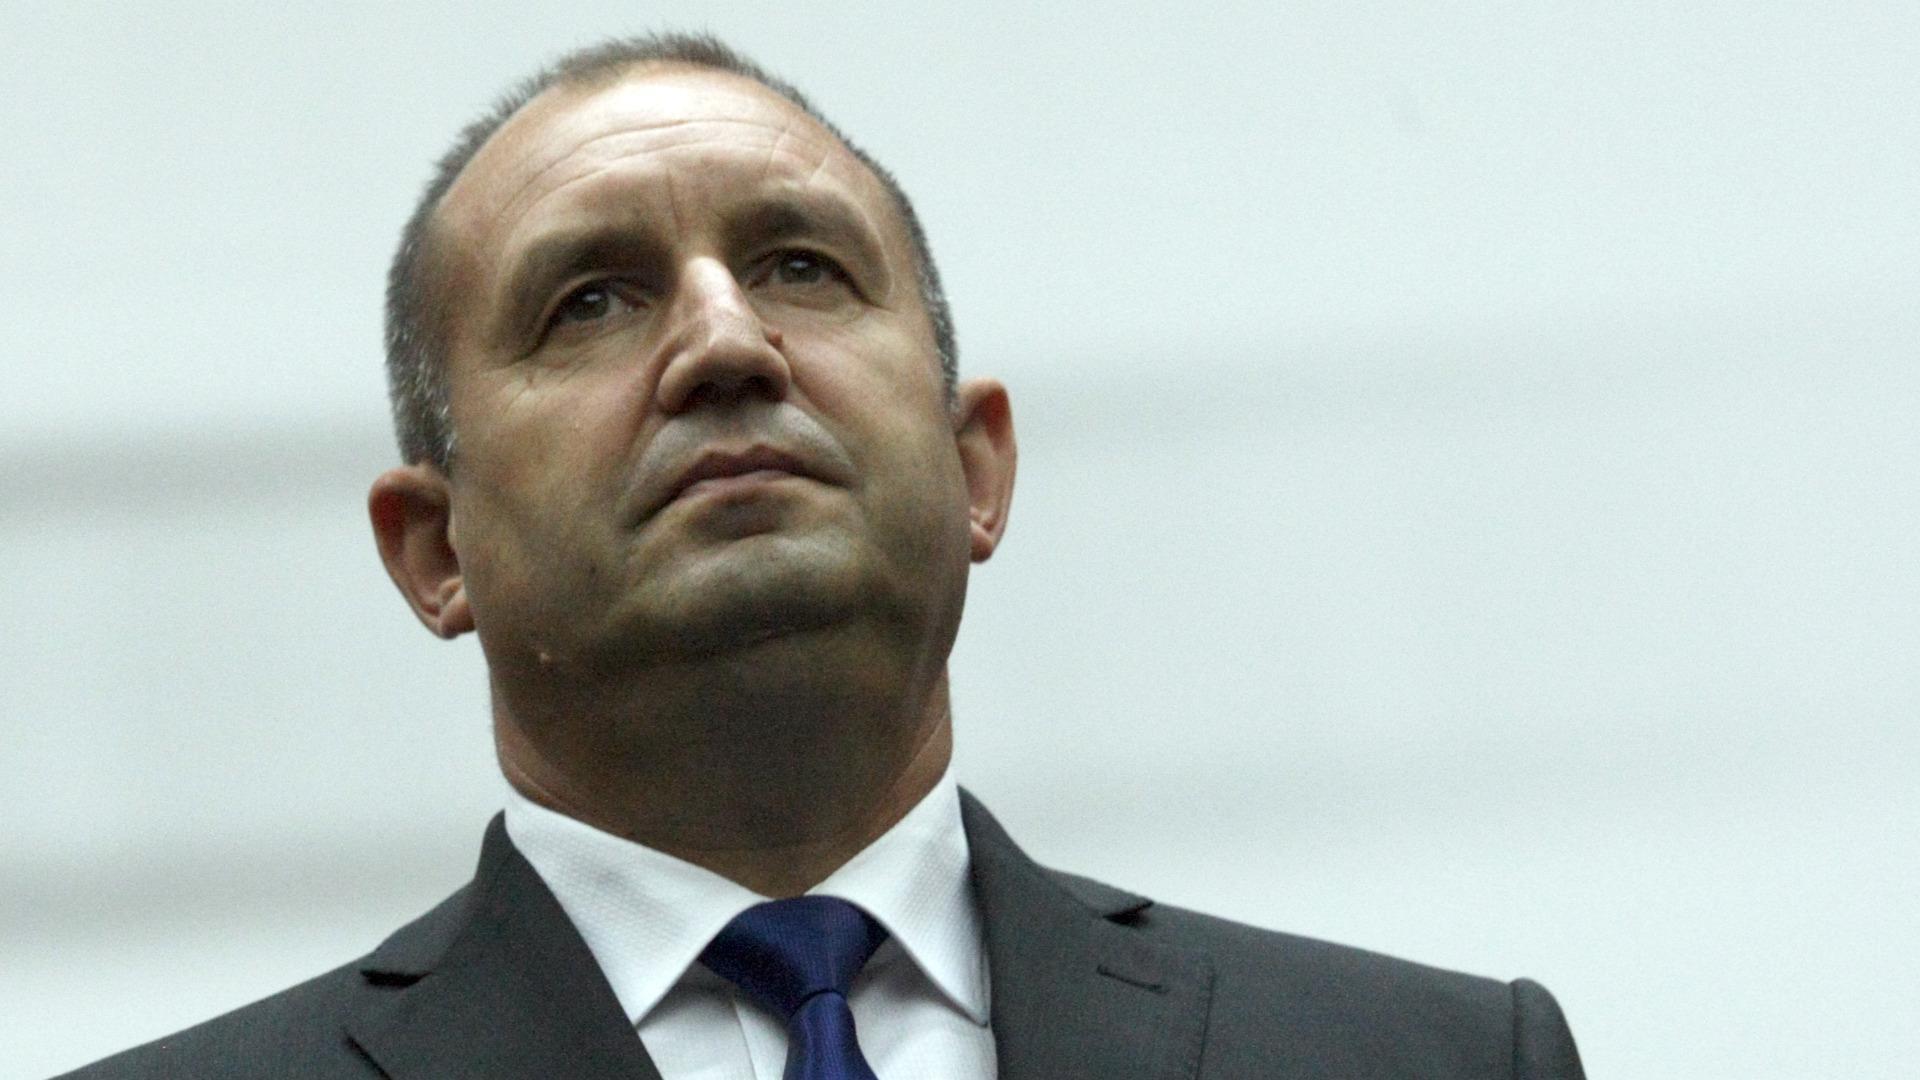 Radev on official visit to fYROMacedonia